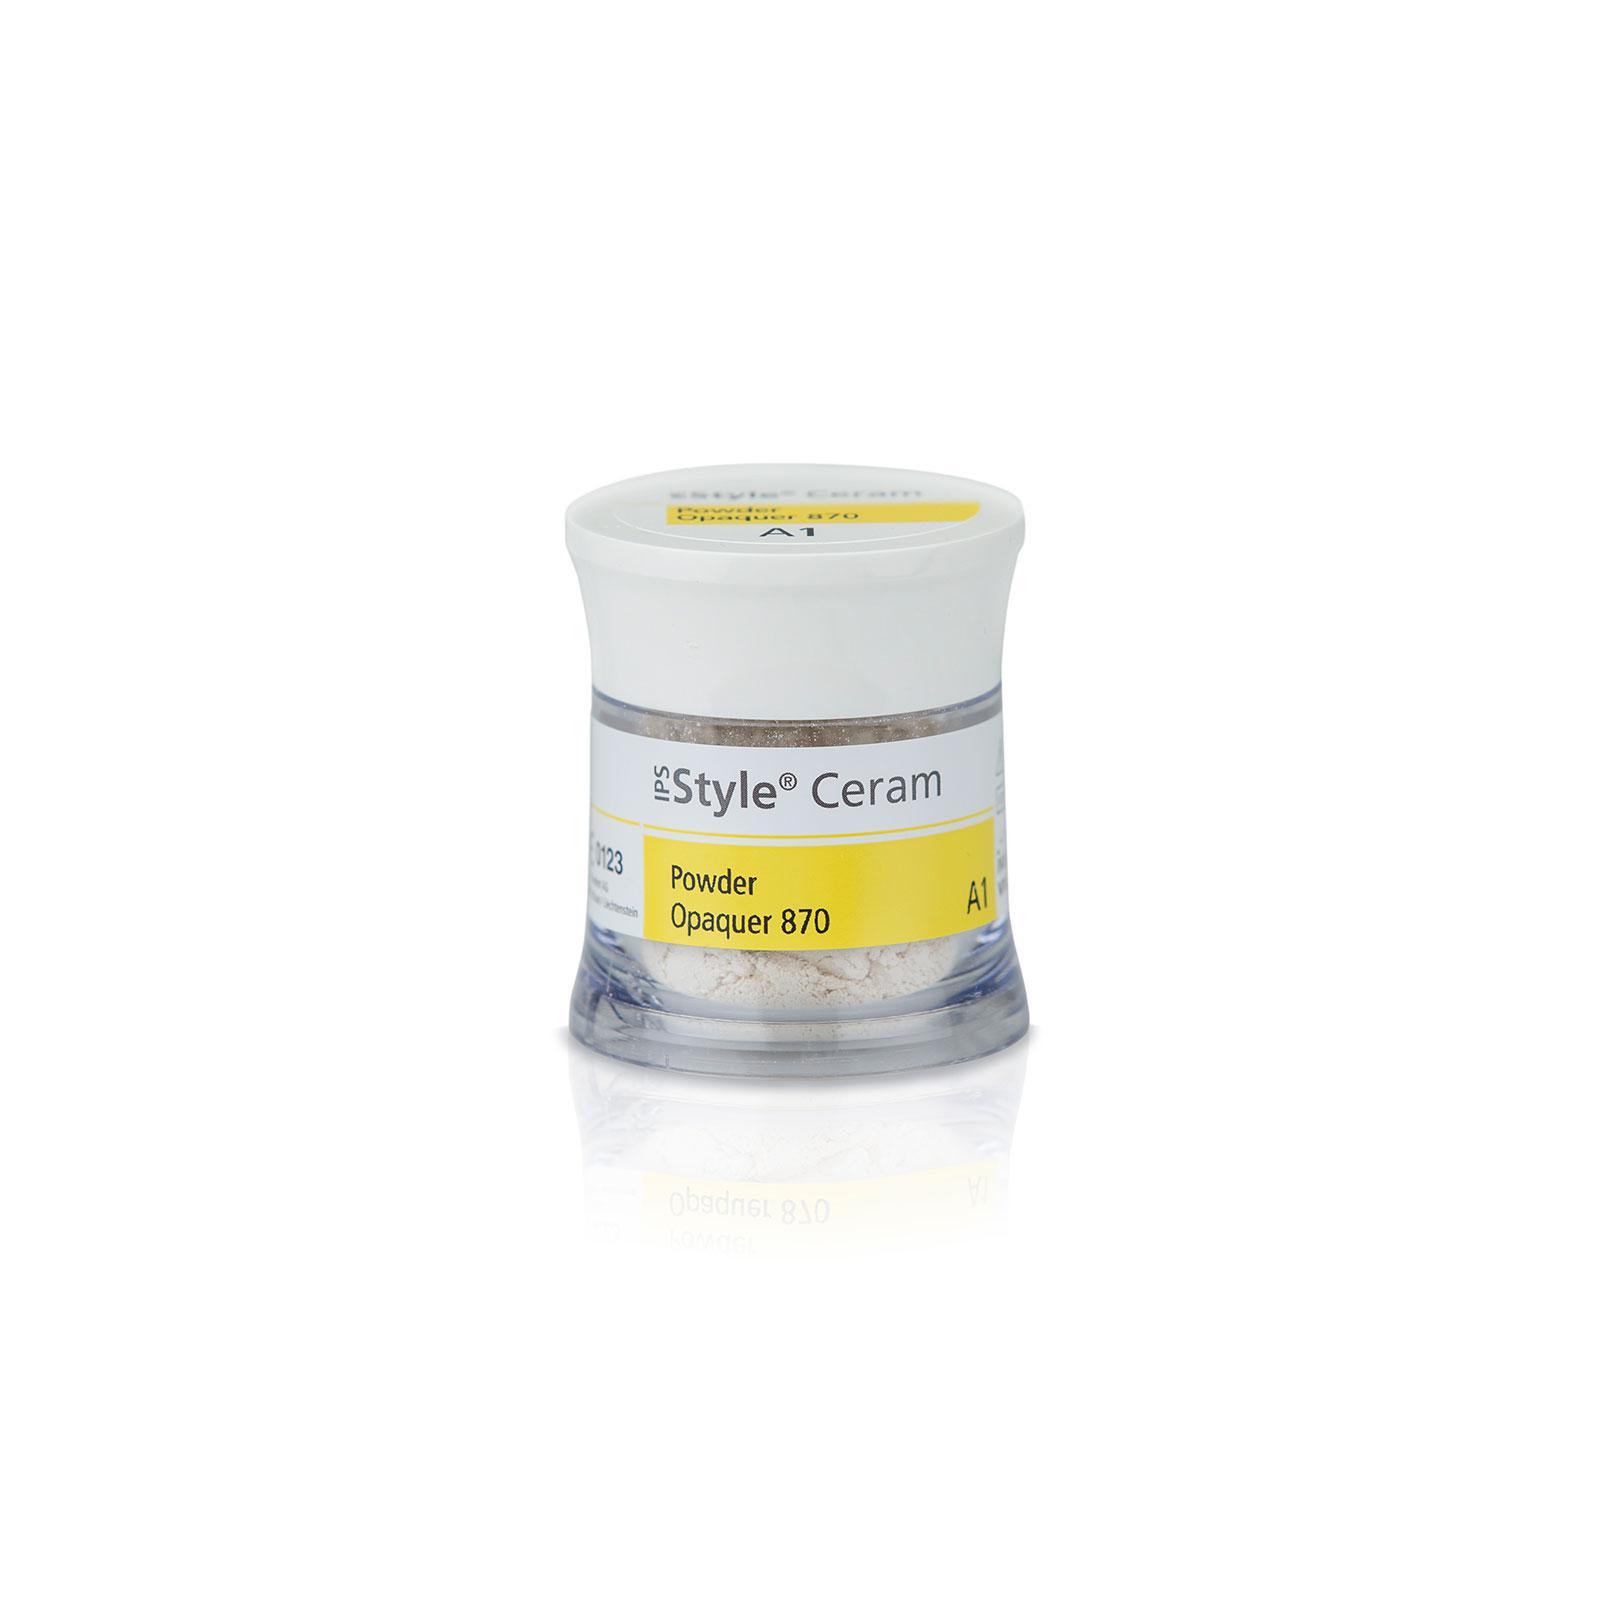 IPS Style Ceram Pow Opaquer 870 18g B4